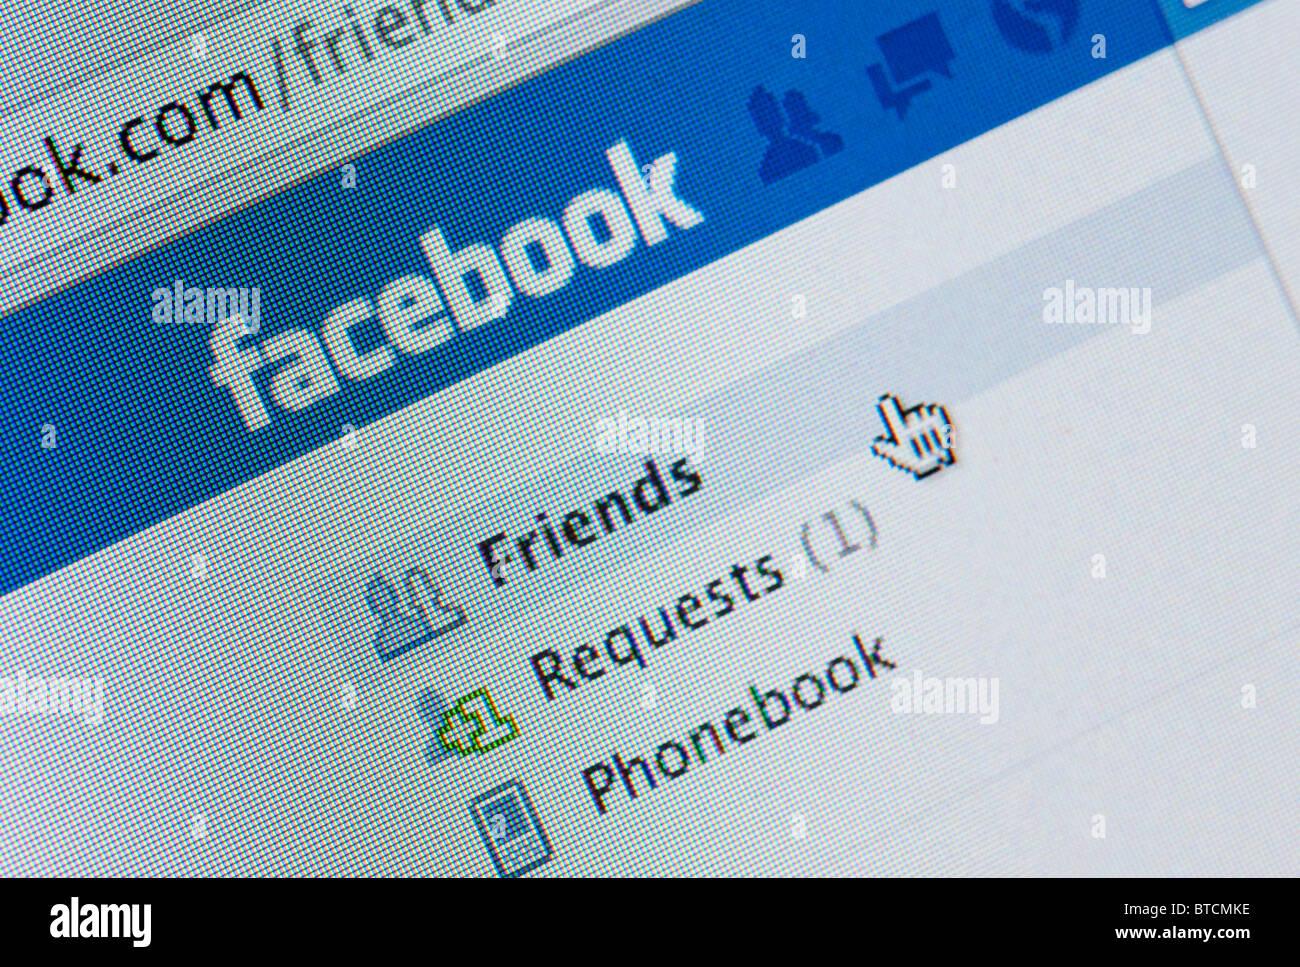 Detail of screenshot from website of Facebook social networking website - Stock Image